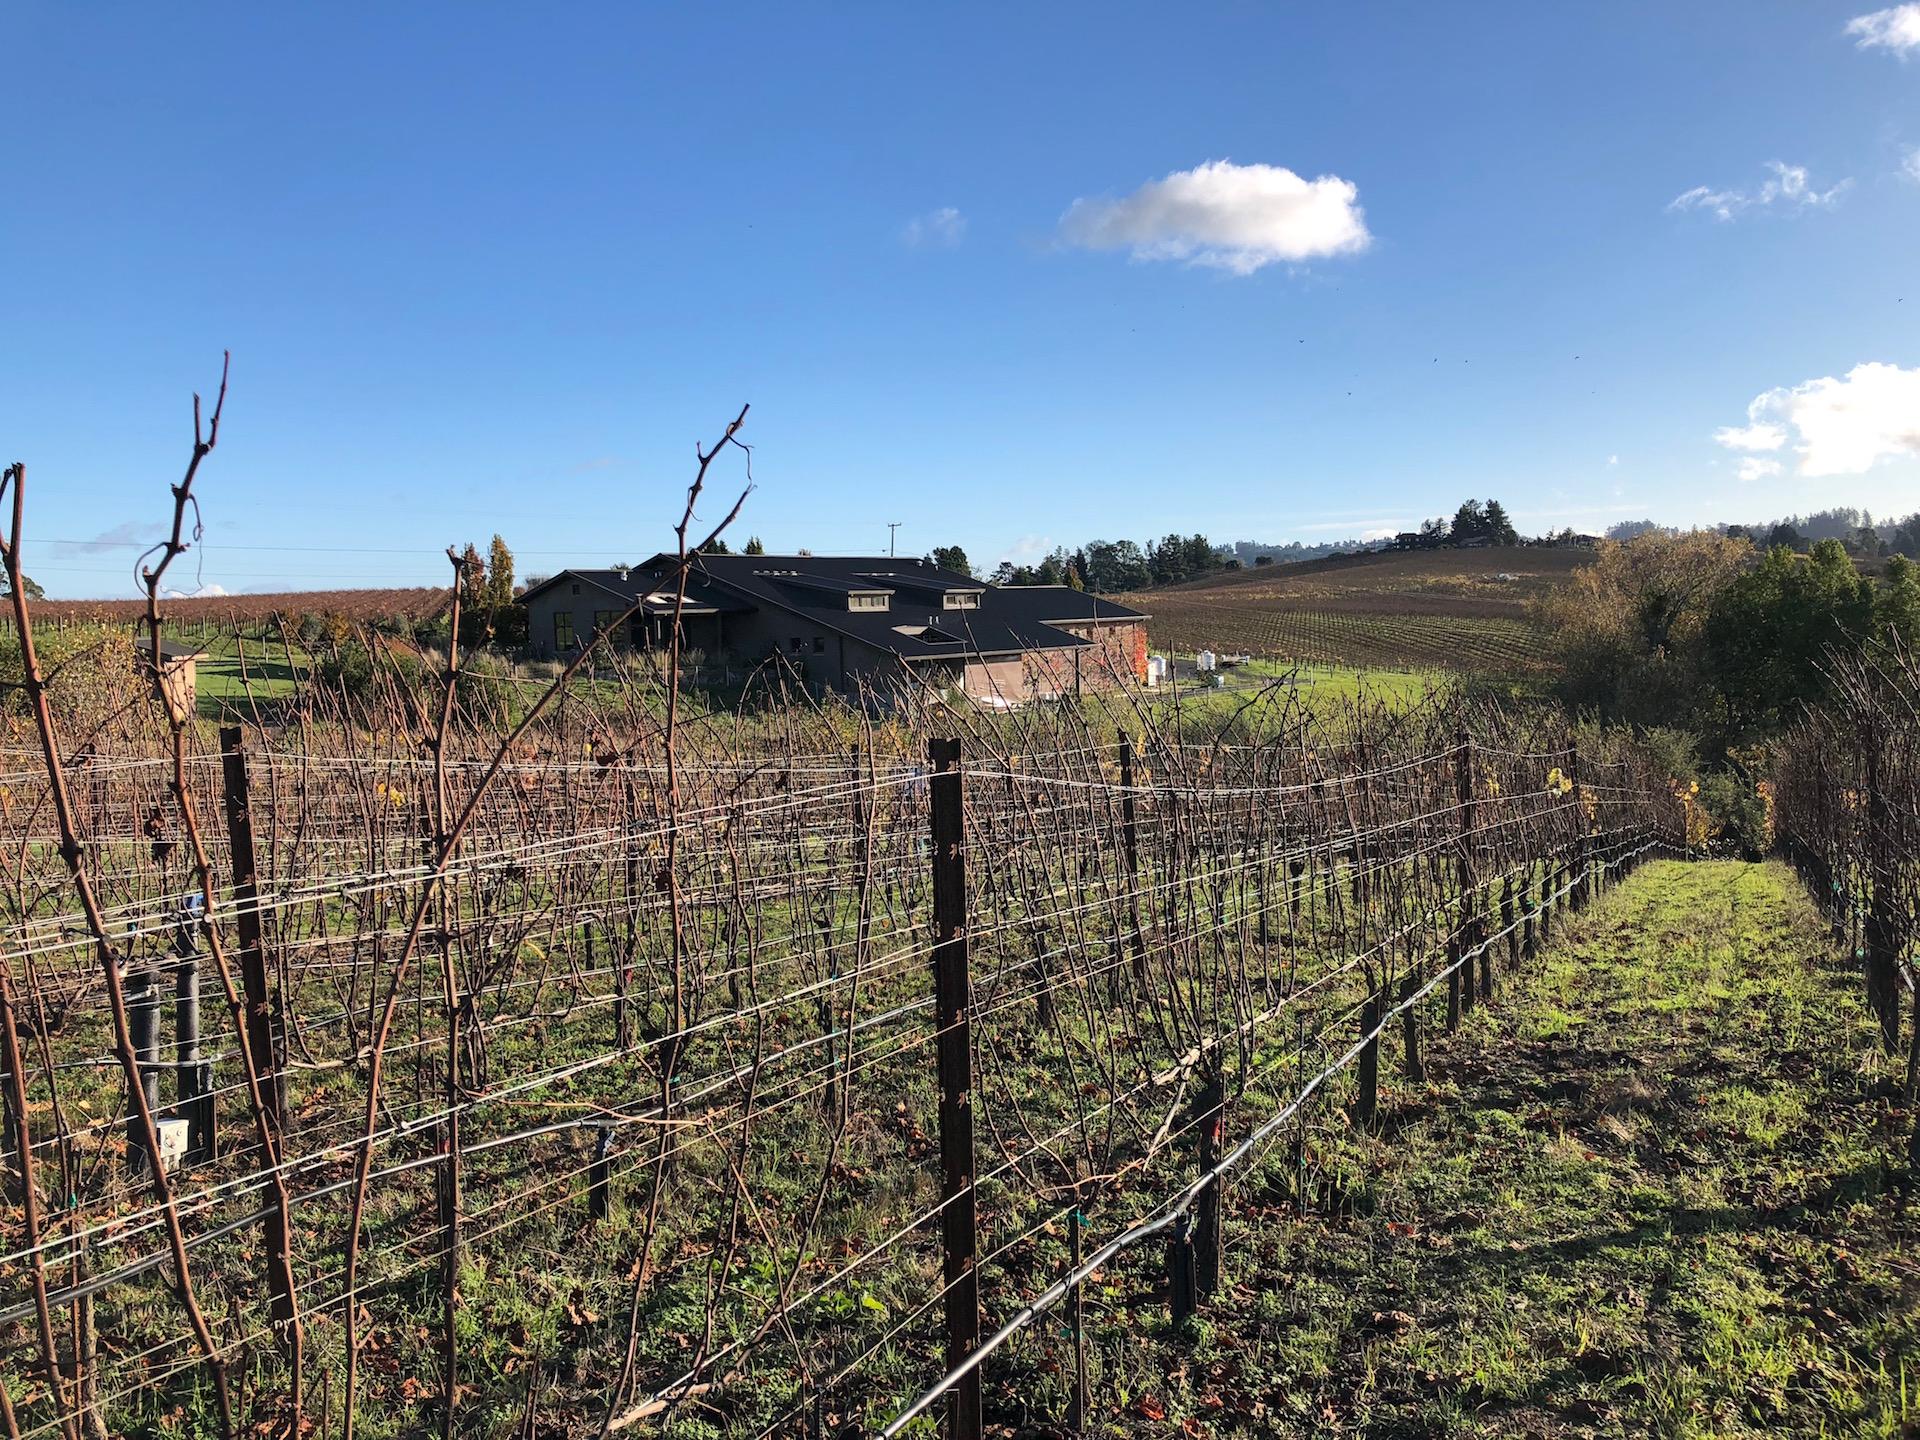 The organic estate vineyards at Littorai Wines in Sebastopol